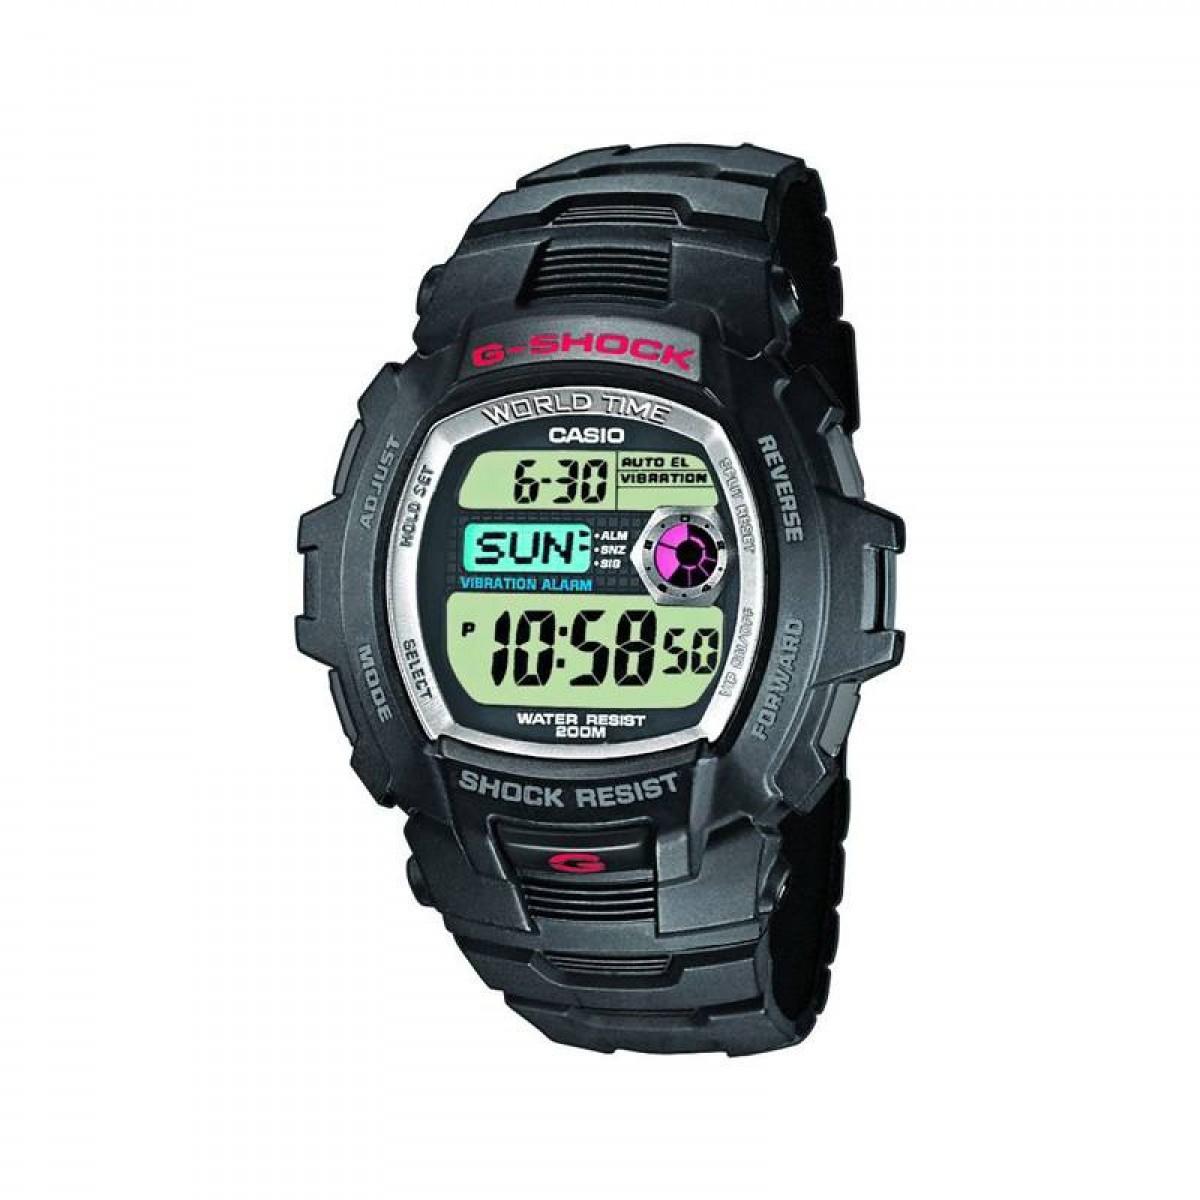 Часовник Casio G-Shock G-7500-1VER